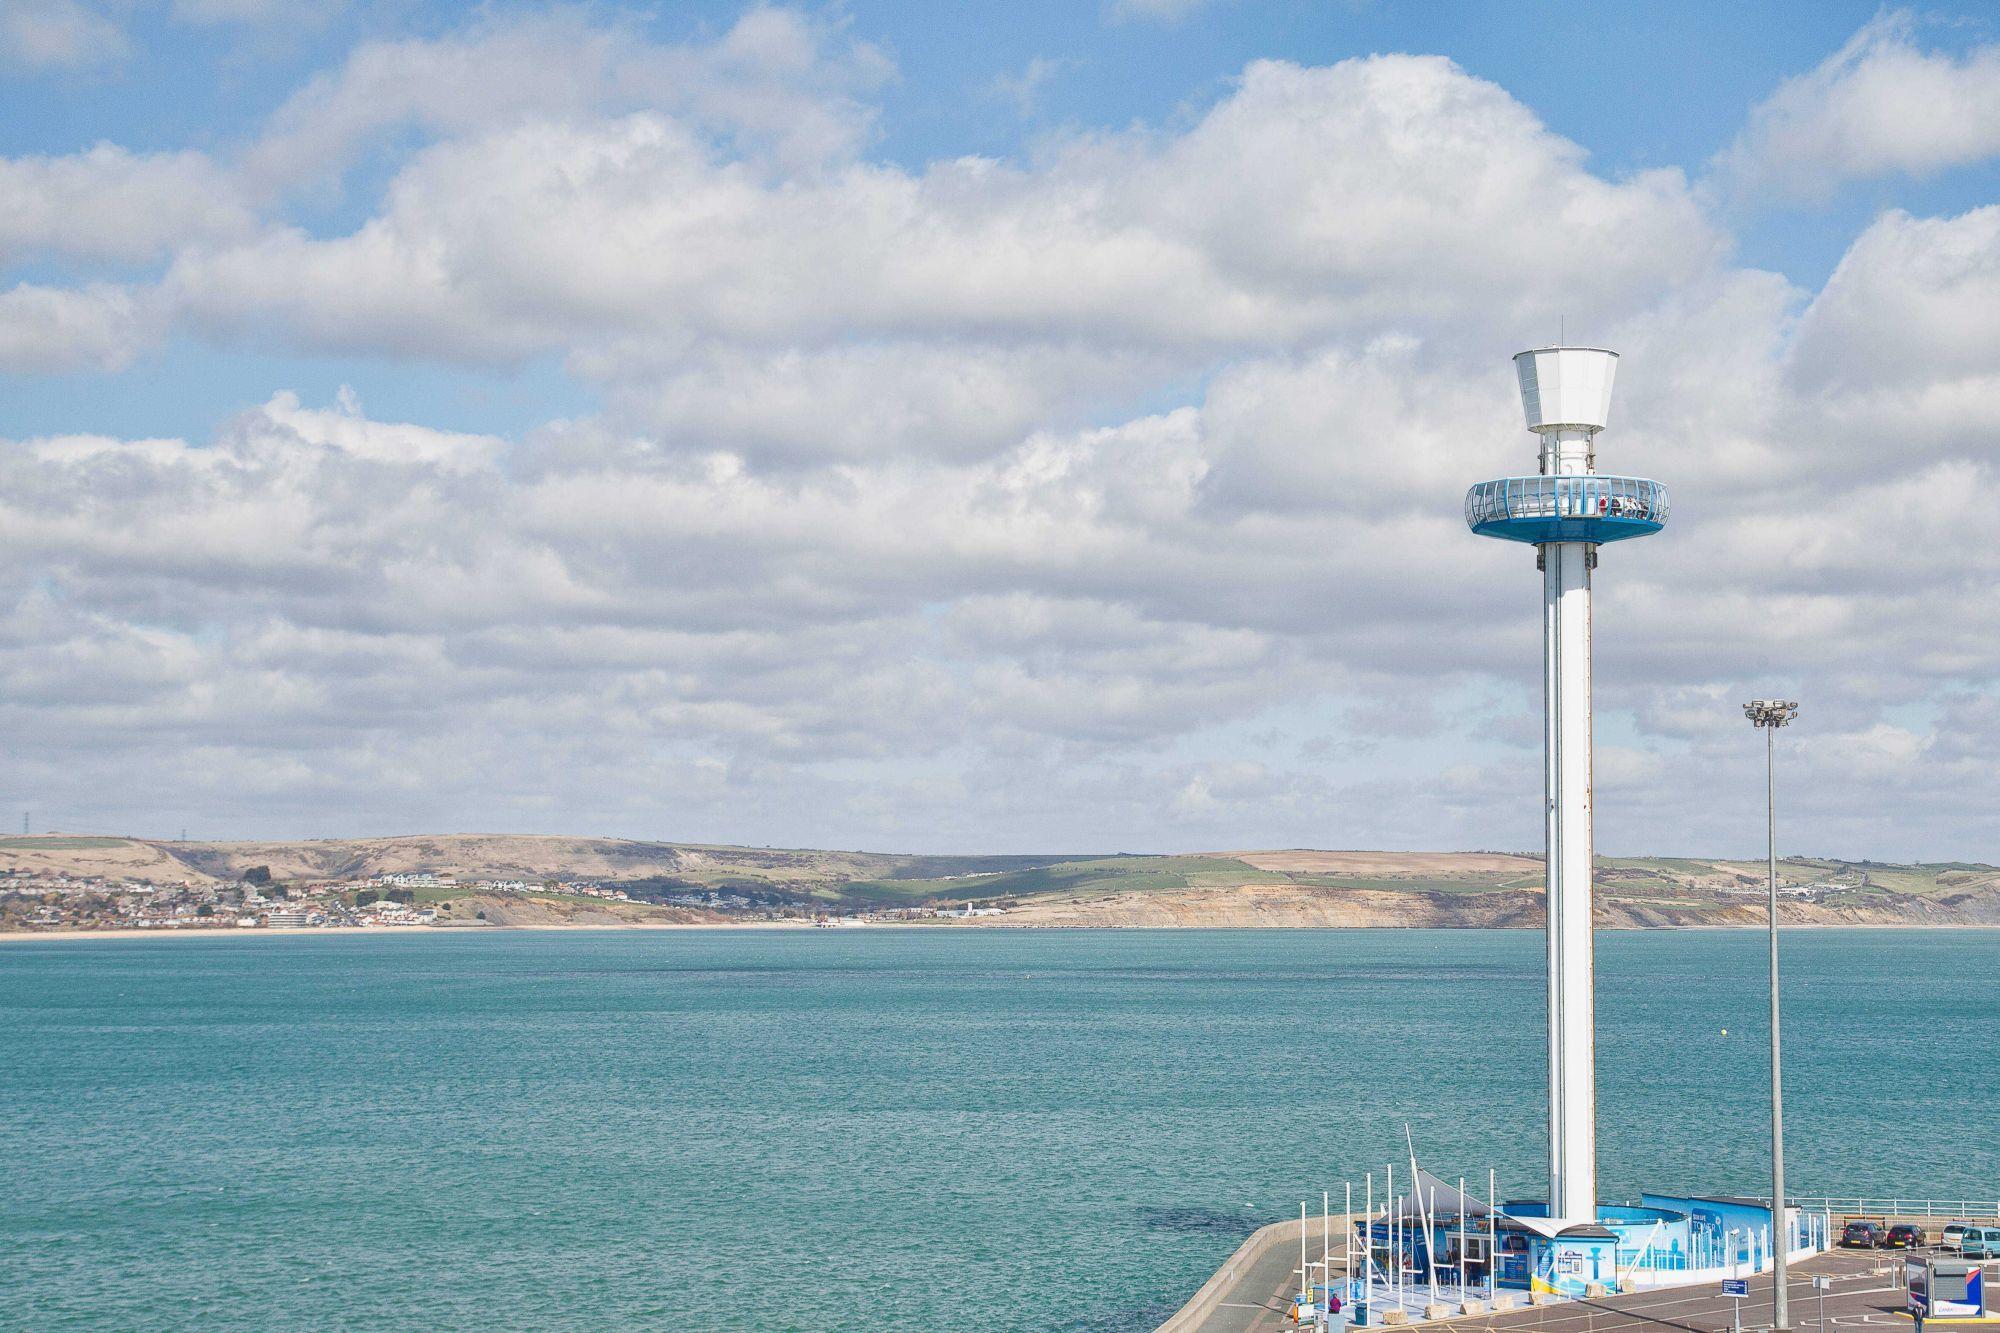 Work begins to remove Weymouth's Jurassic Skyline tower - Dorset Echo